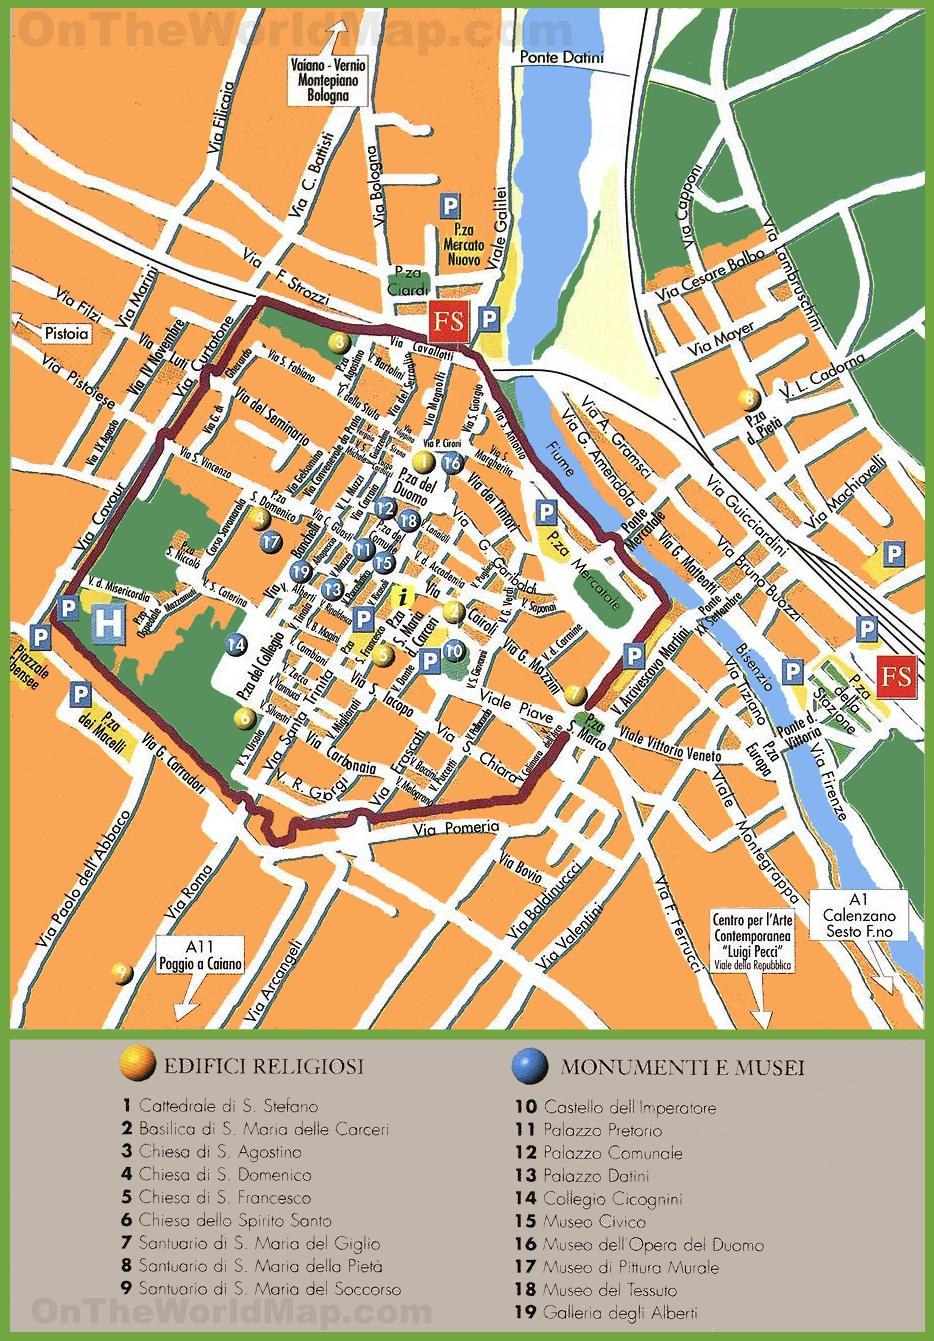 Prato tourist map